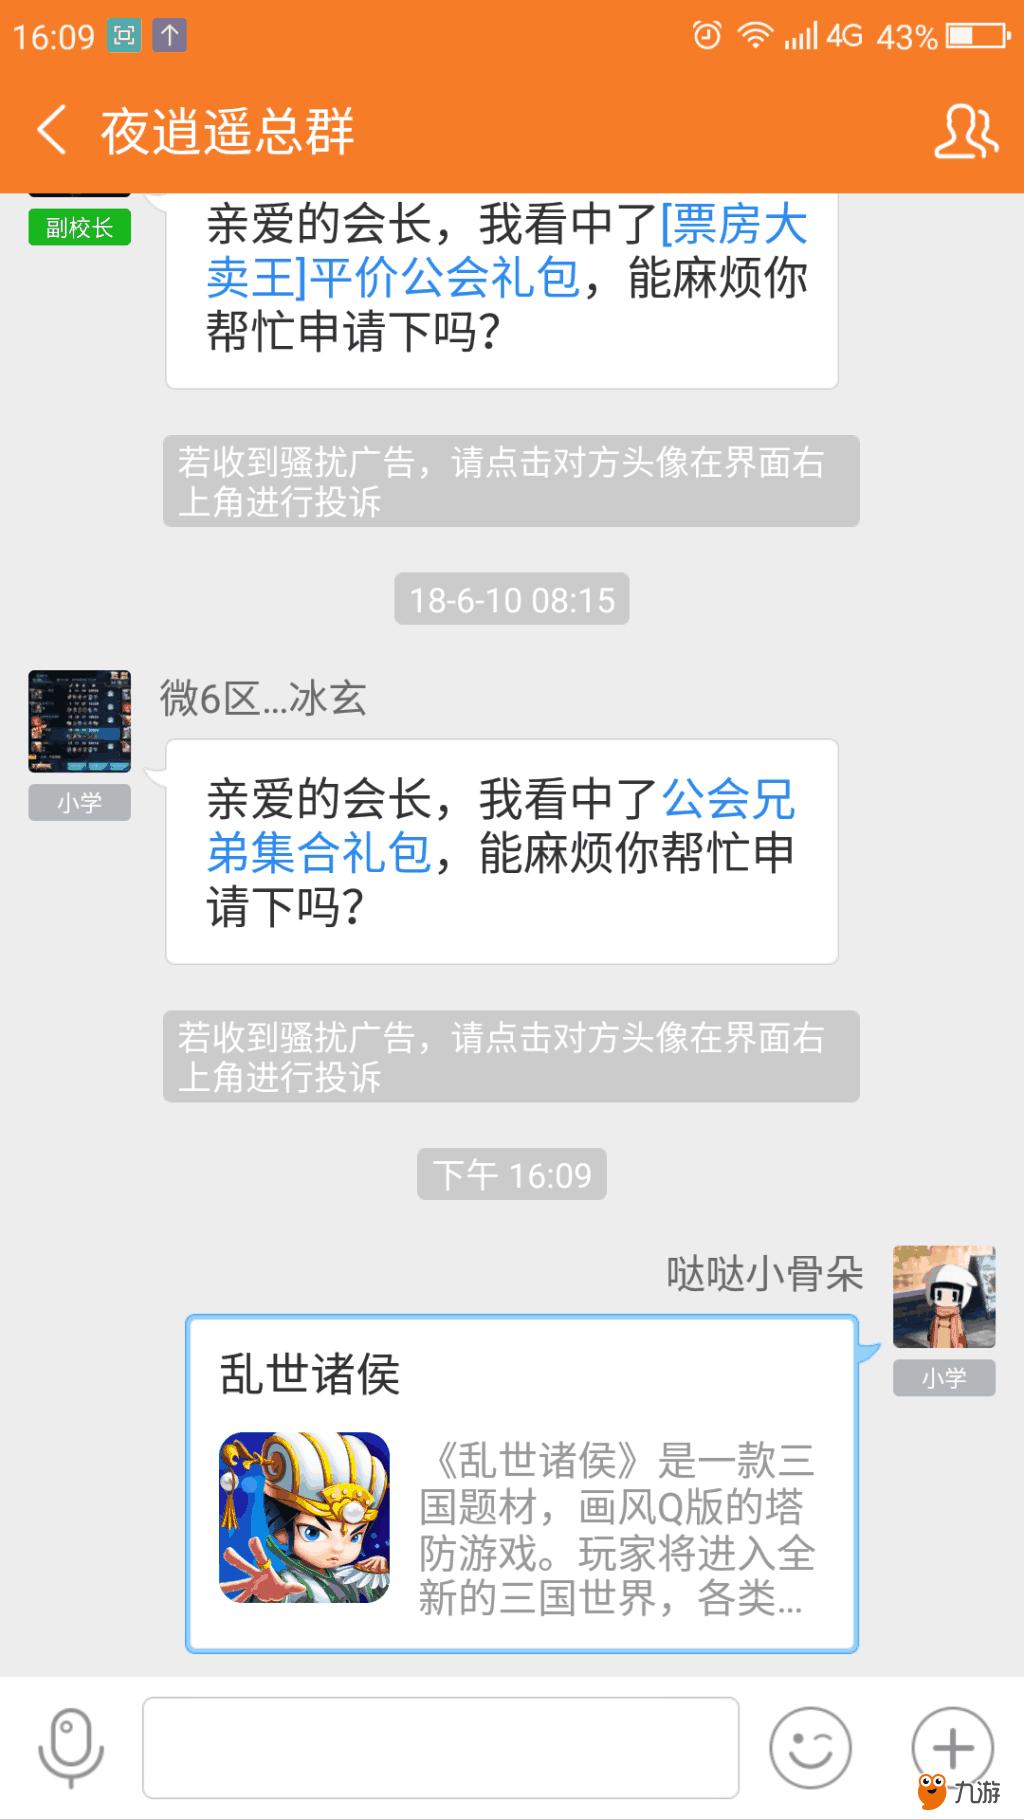 Screenshot_2018s06s16s16s09s10.png